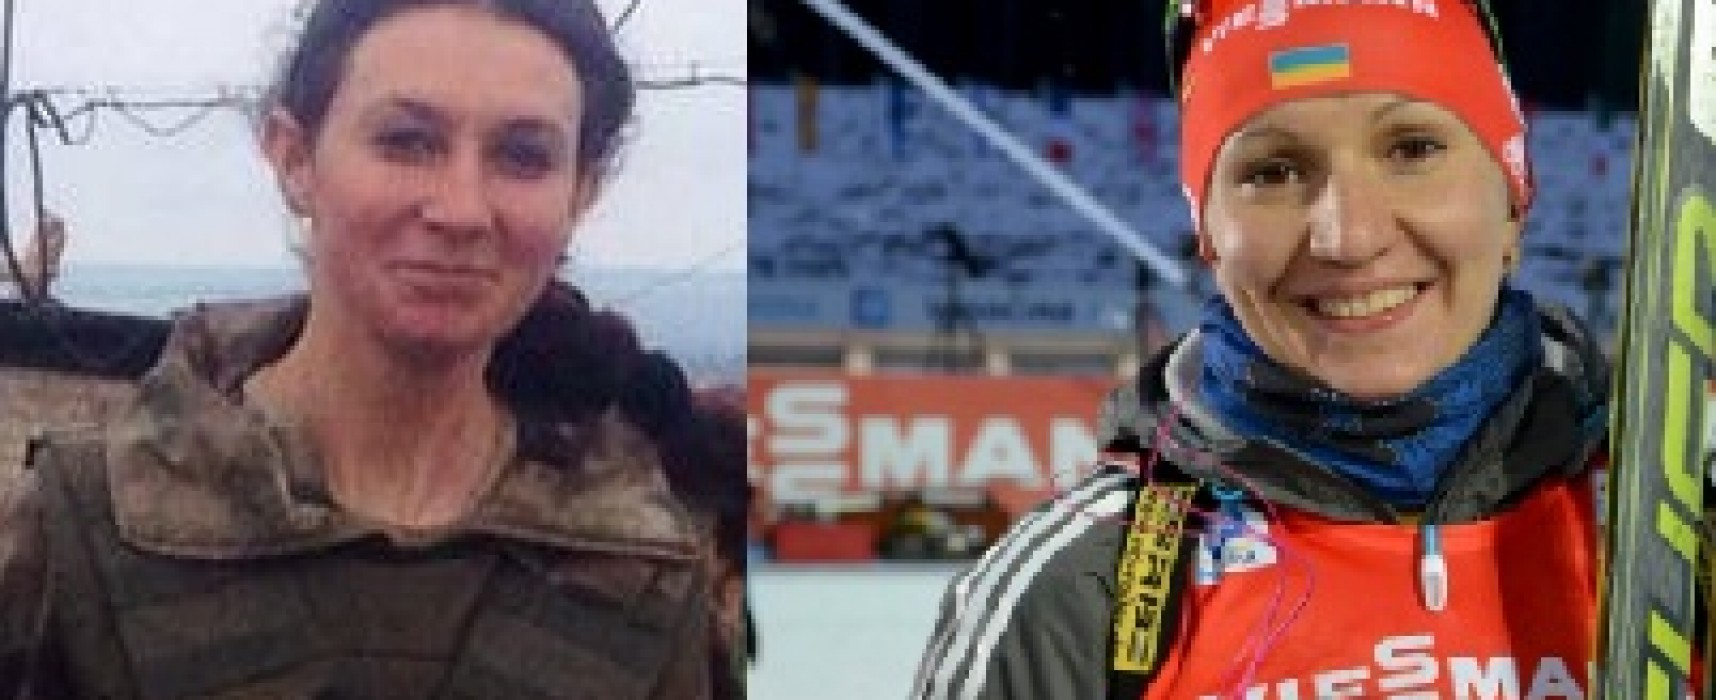 Fake: Ukrainian biathlonist Olena Pidhrushna kills children in Sloviansk